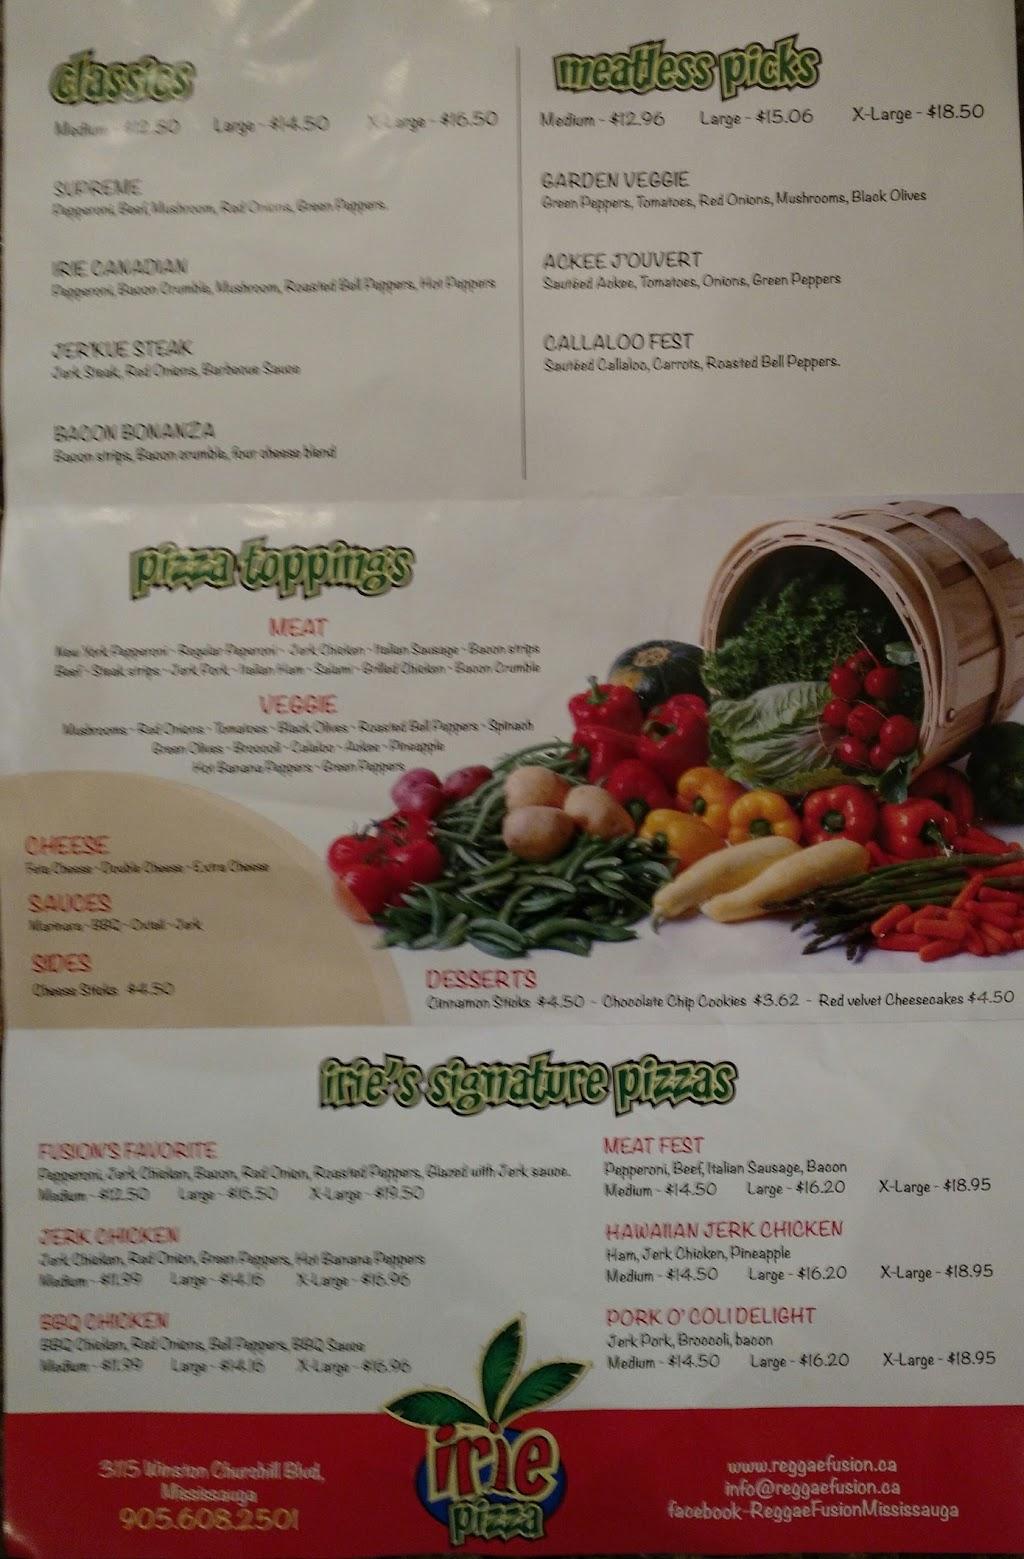 Irie Pizza | restaurant | 3115 Winston Churchill Blvd, Mississauga, ON L5L 5S3 Winston Churchill Blvd, Mississauga, ON L5L 5S3, Canada | 9056082501 OR +1 905-608-2501